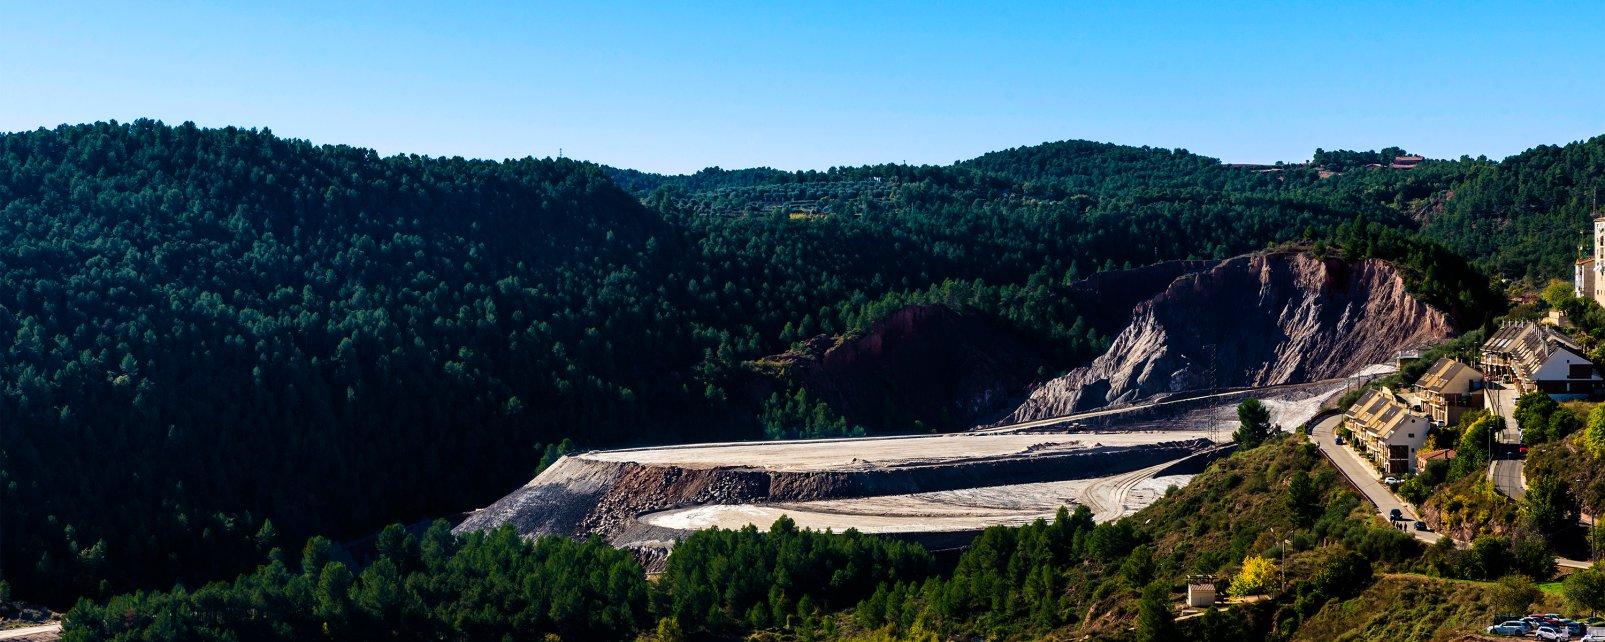 Las minas de sal de Cardona, Las minas de sal de Cardon, Los paisajes, Cataluña